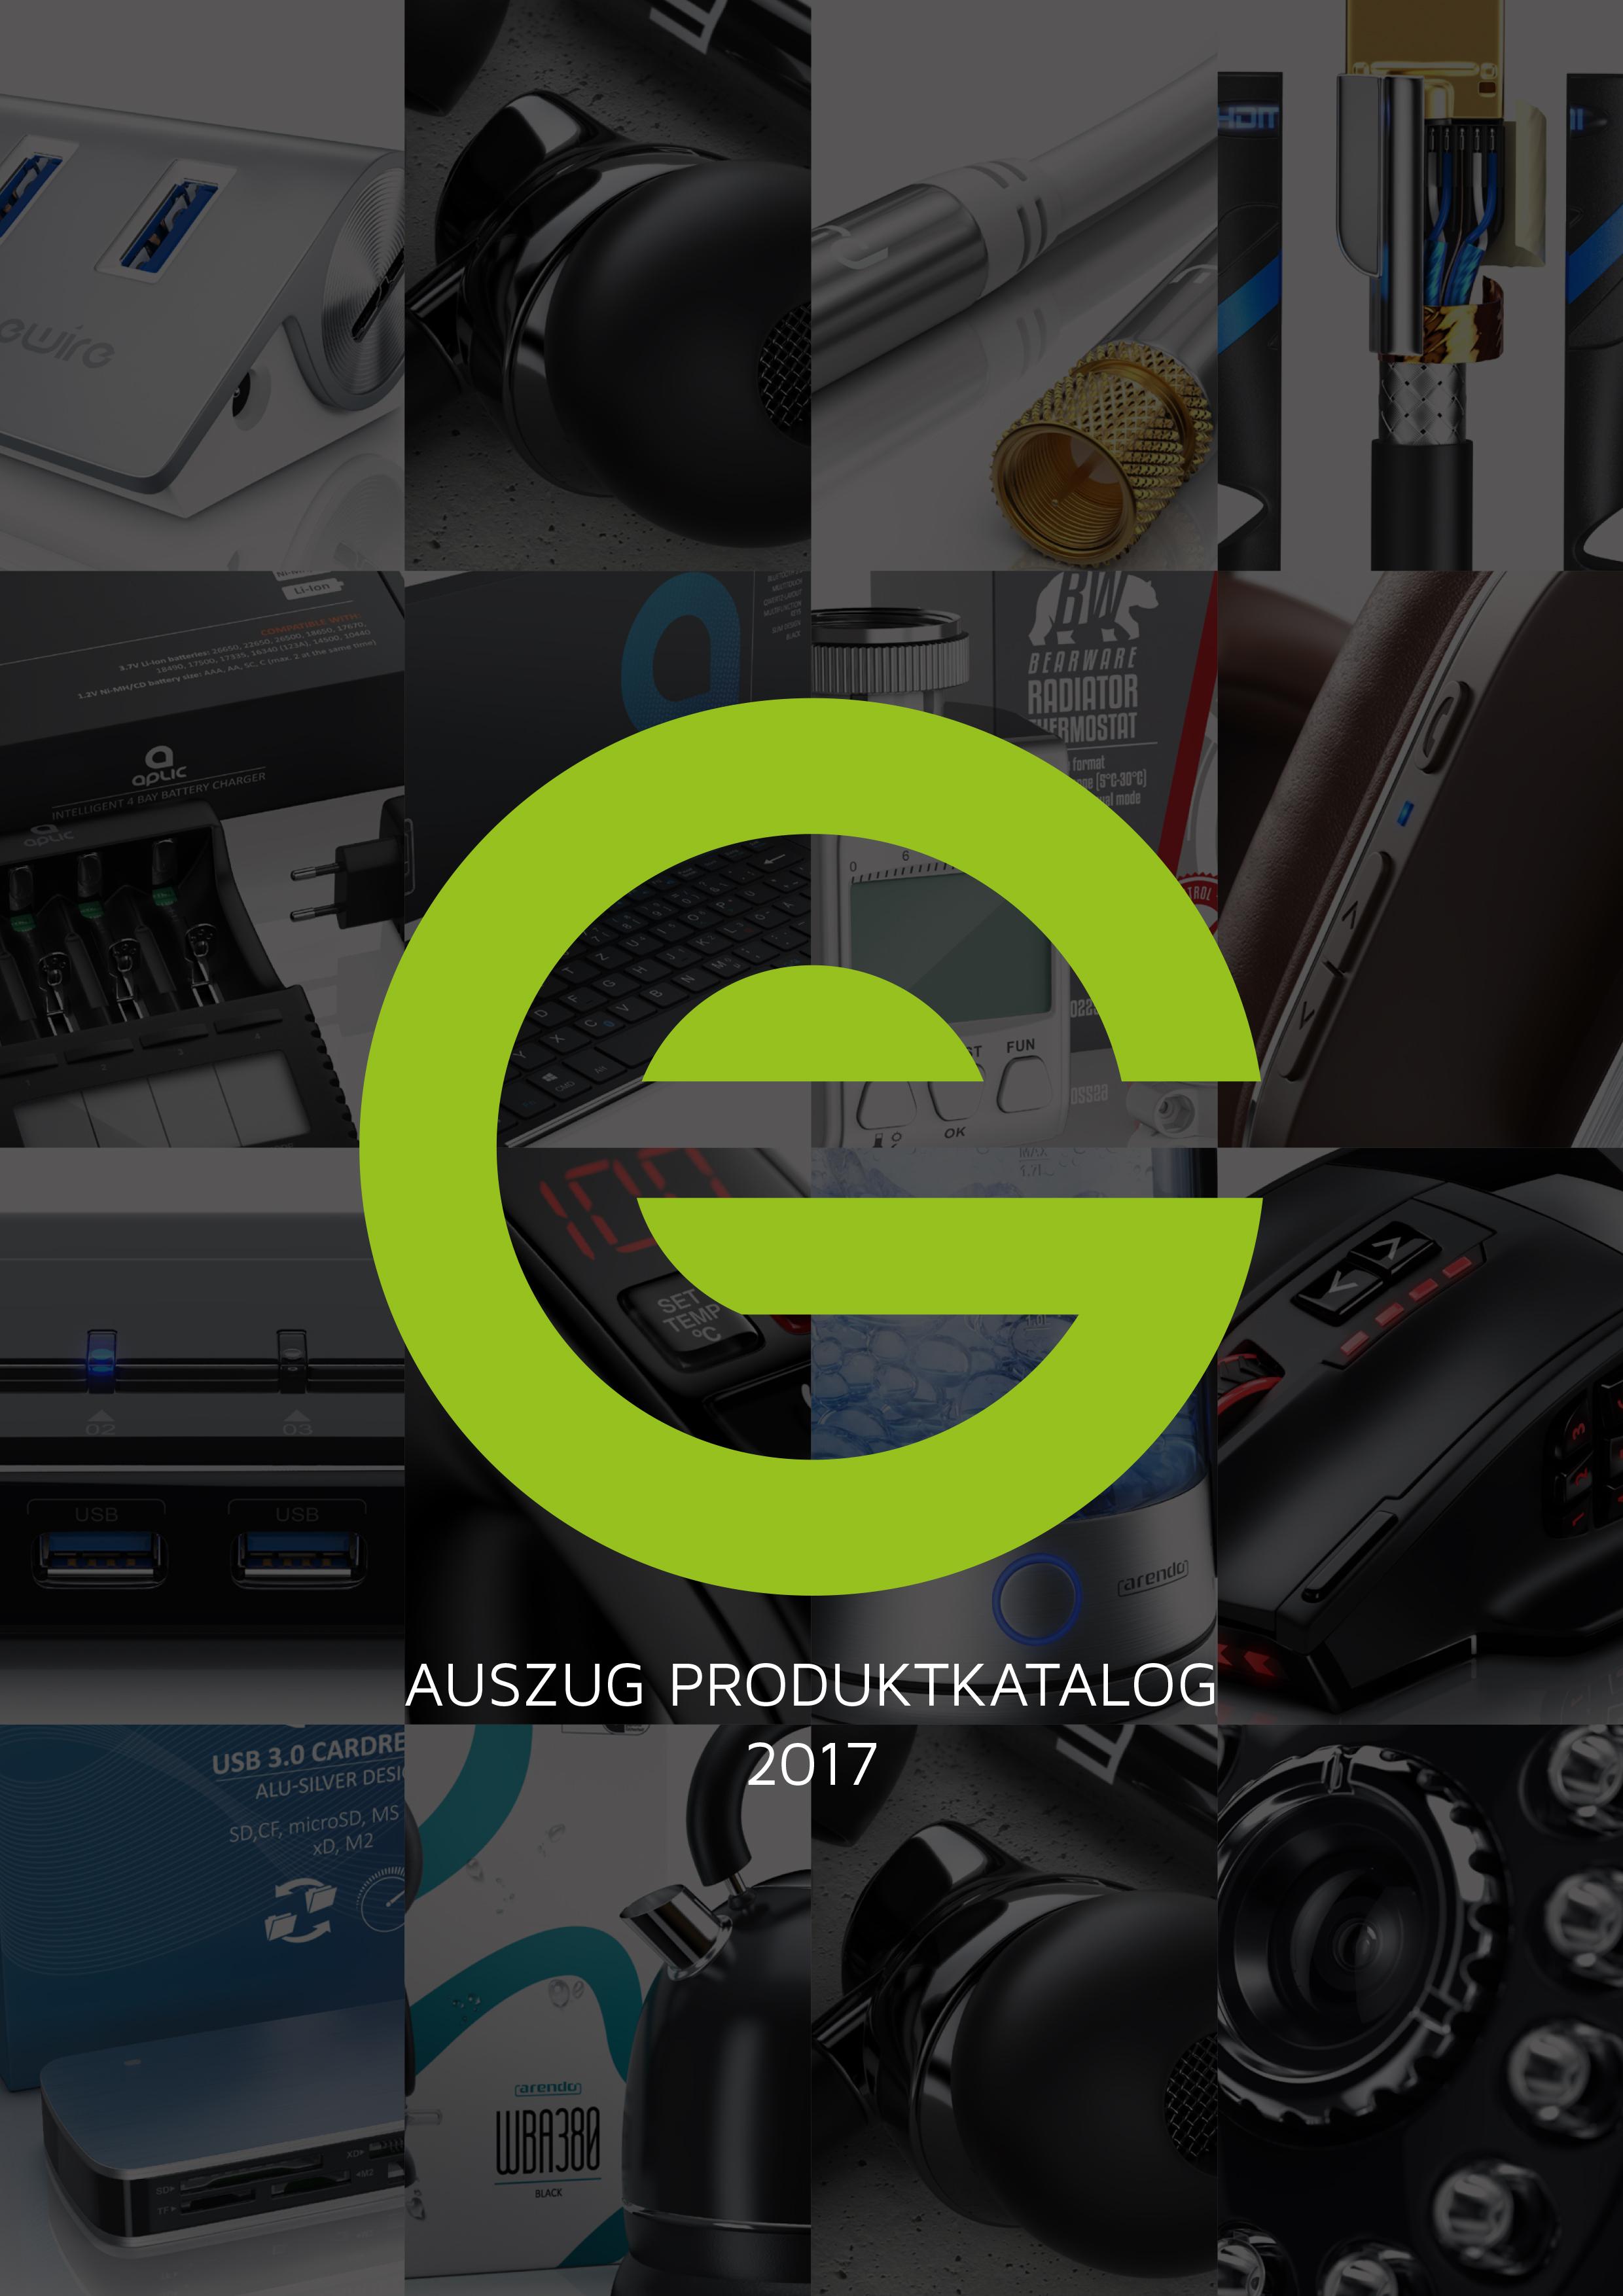 Auszug Produktkatalog 2017..Summary Product Catalog 2017 (GER)